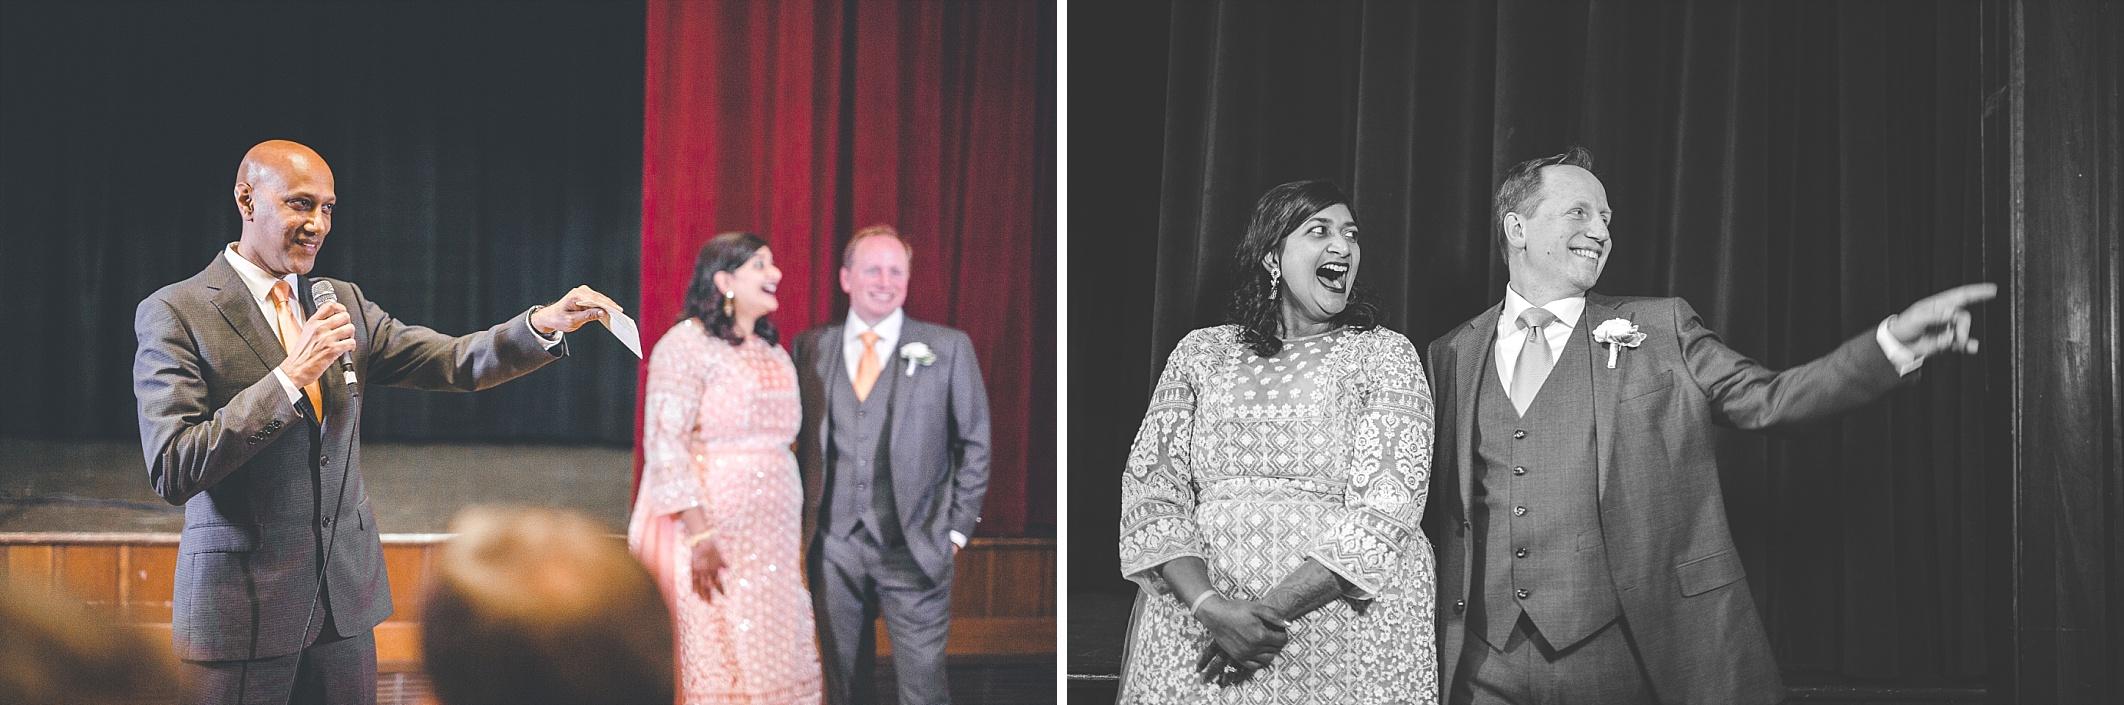 2722_dayton-indian-wedding-photographer-beavercreek_0078.jpg